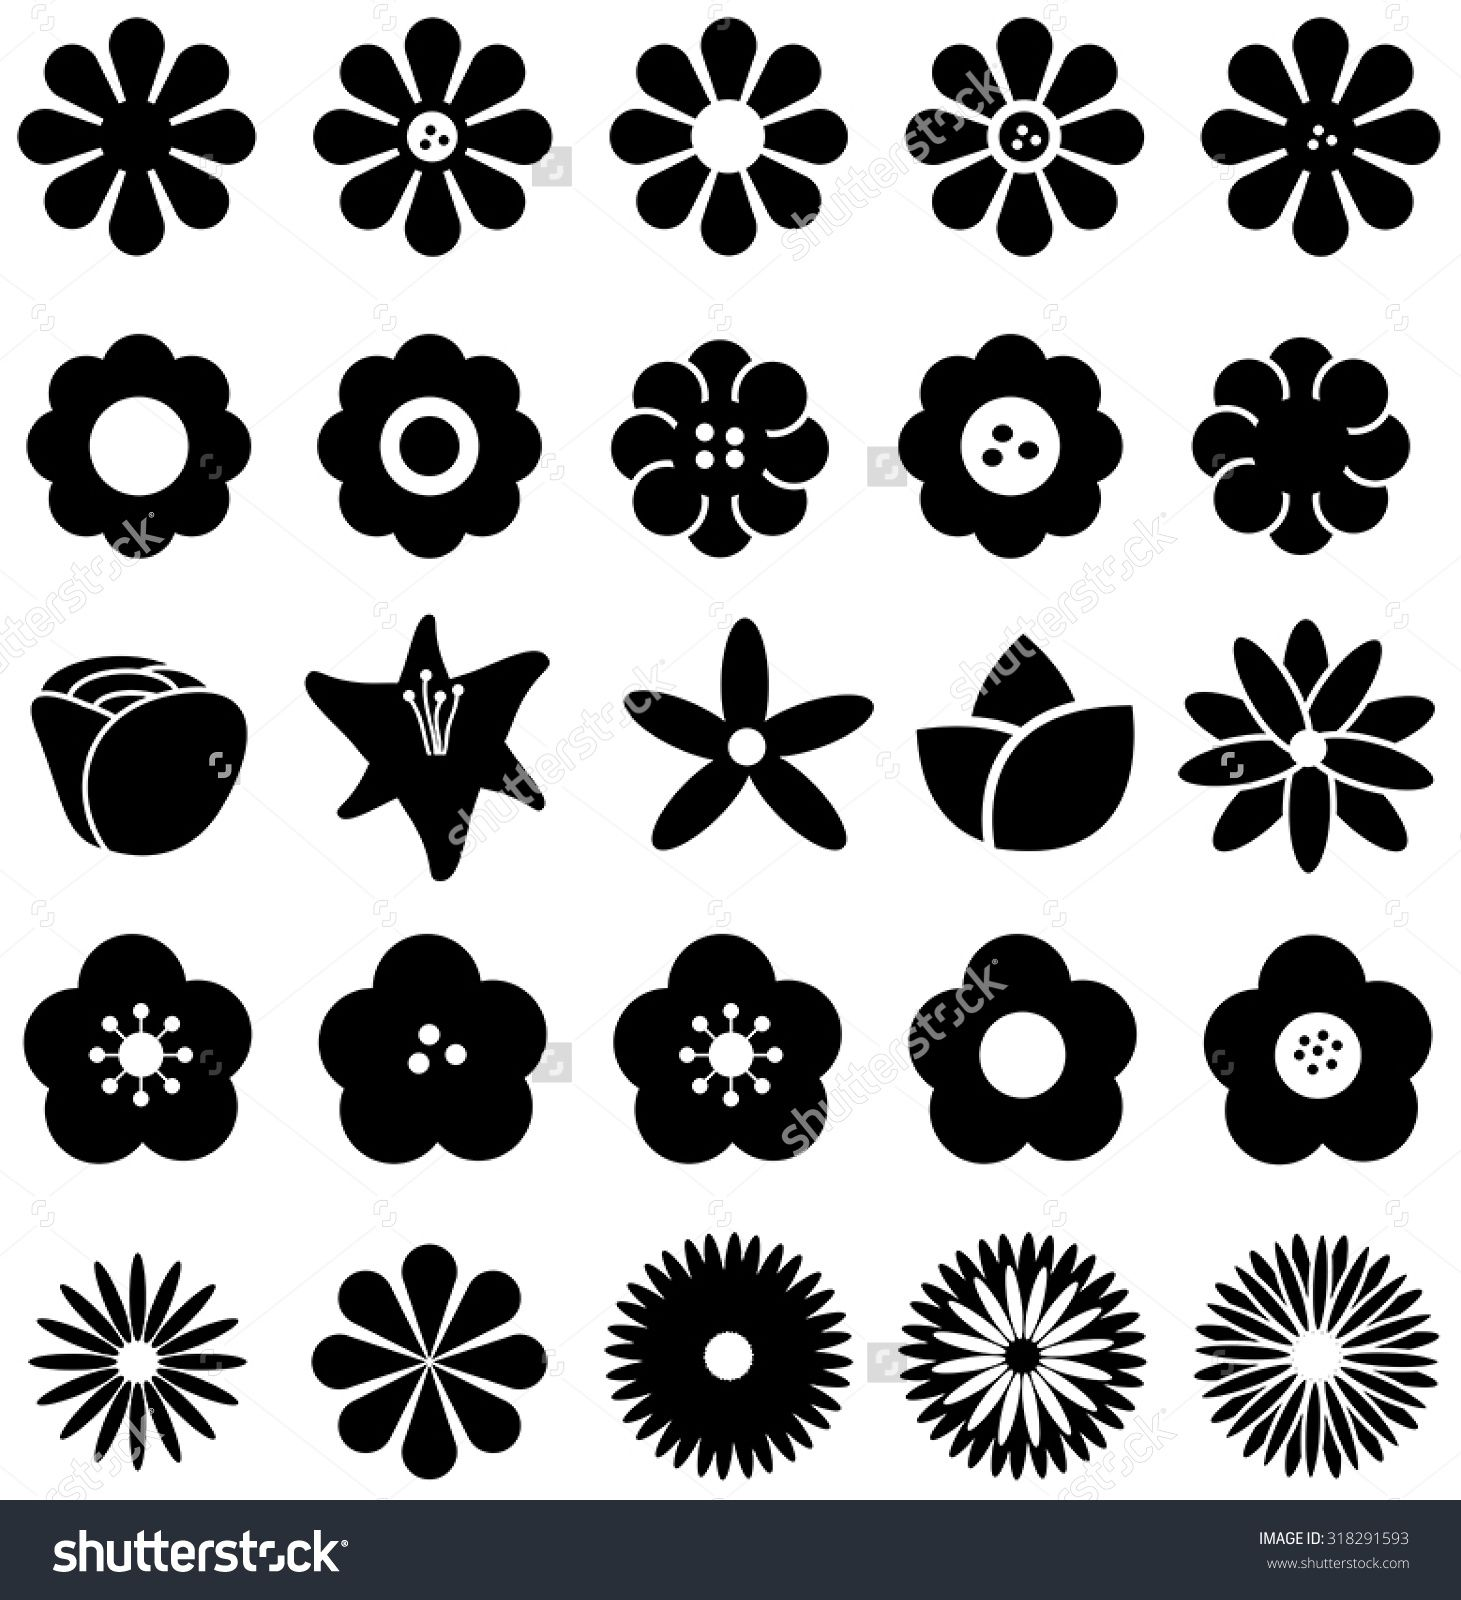 flower silhouettes | Simple Daisy Silhouette simple shape ...